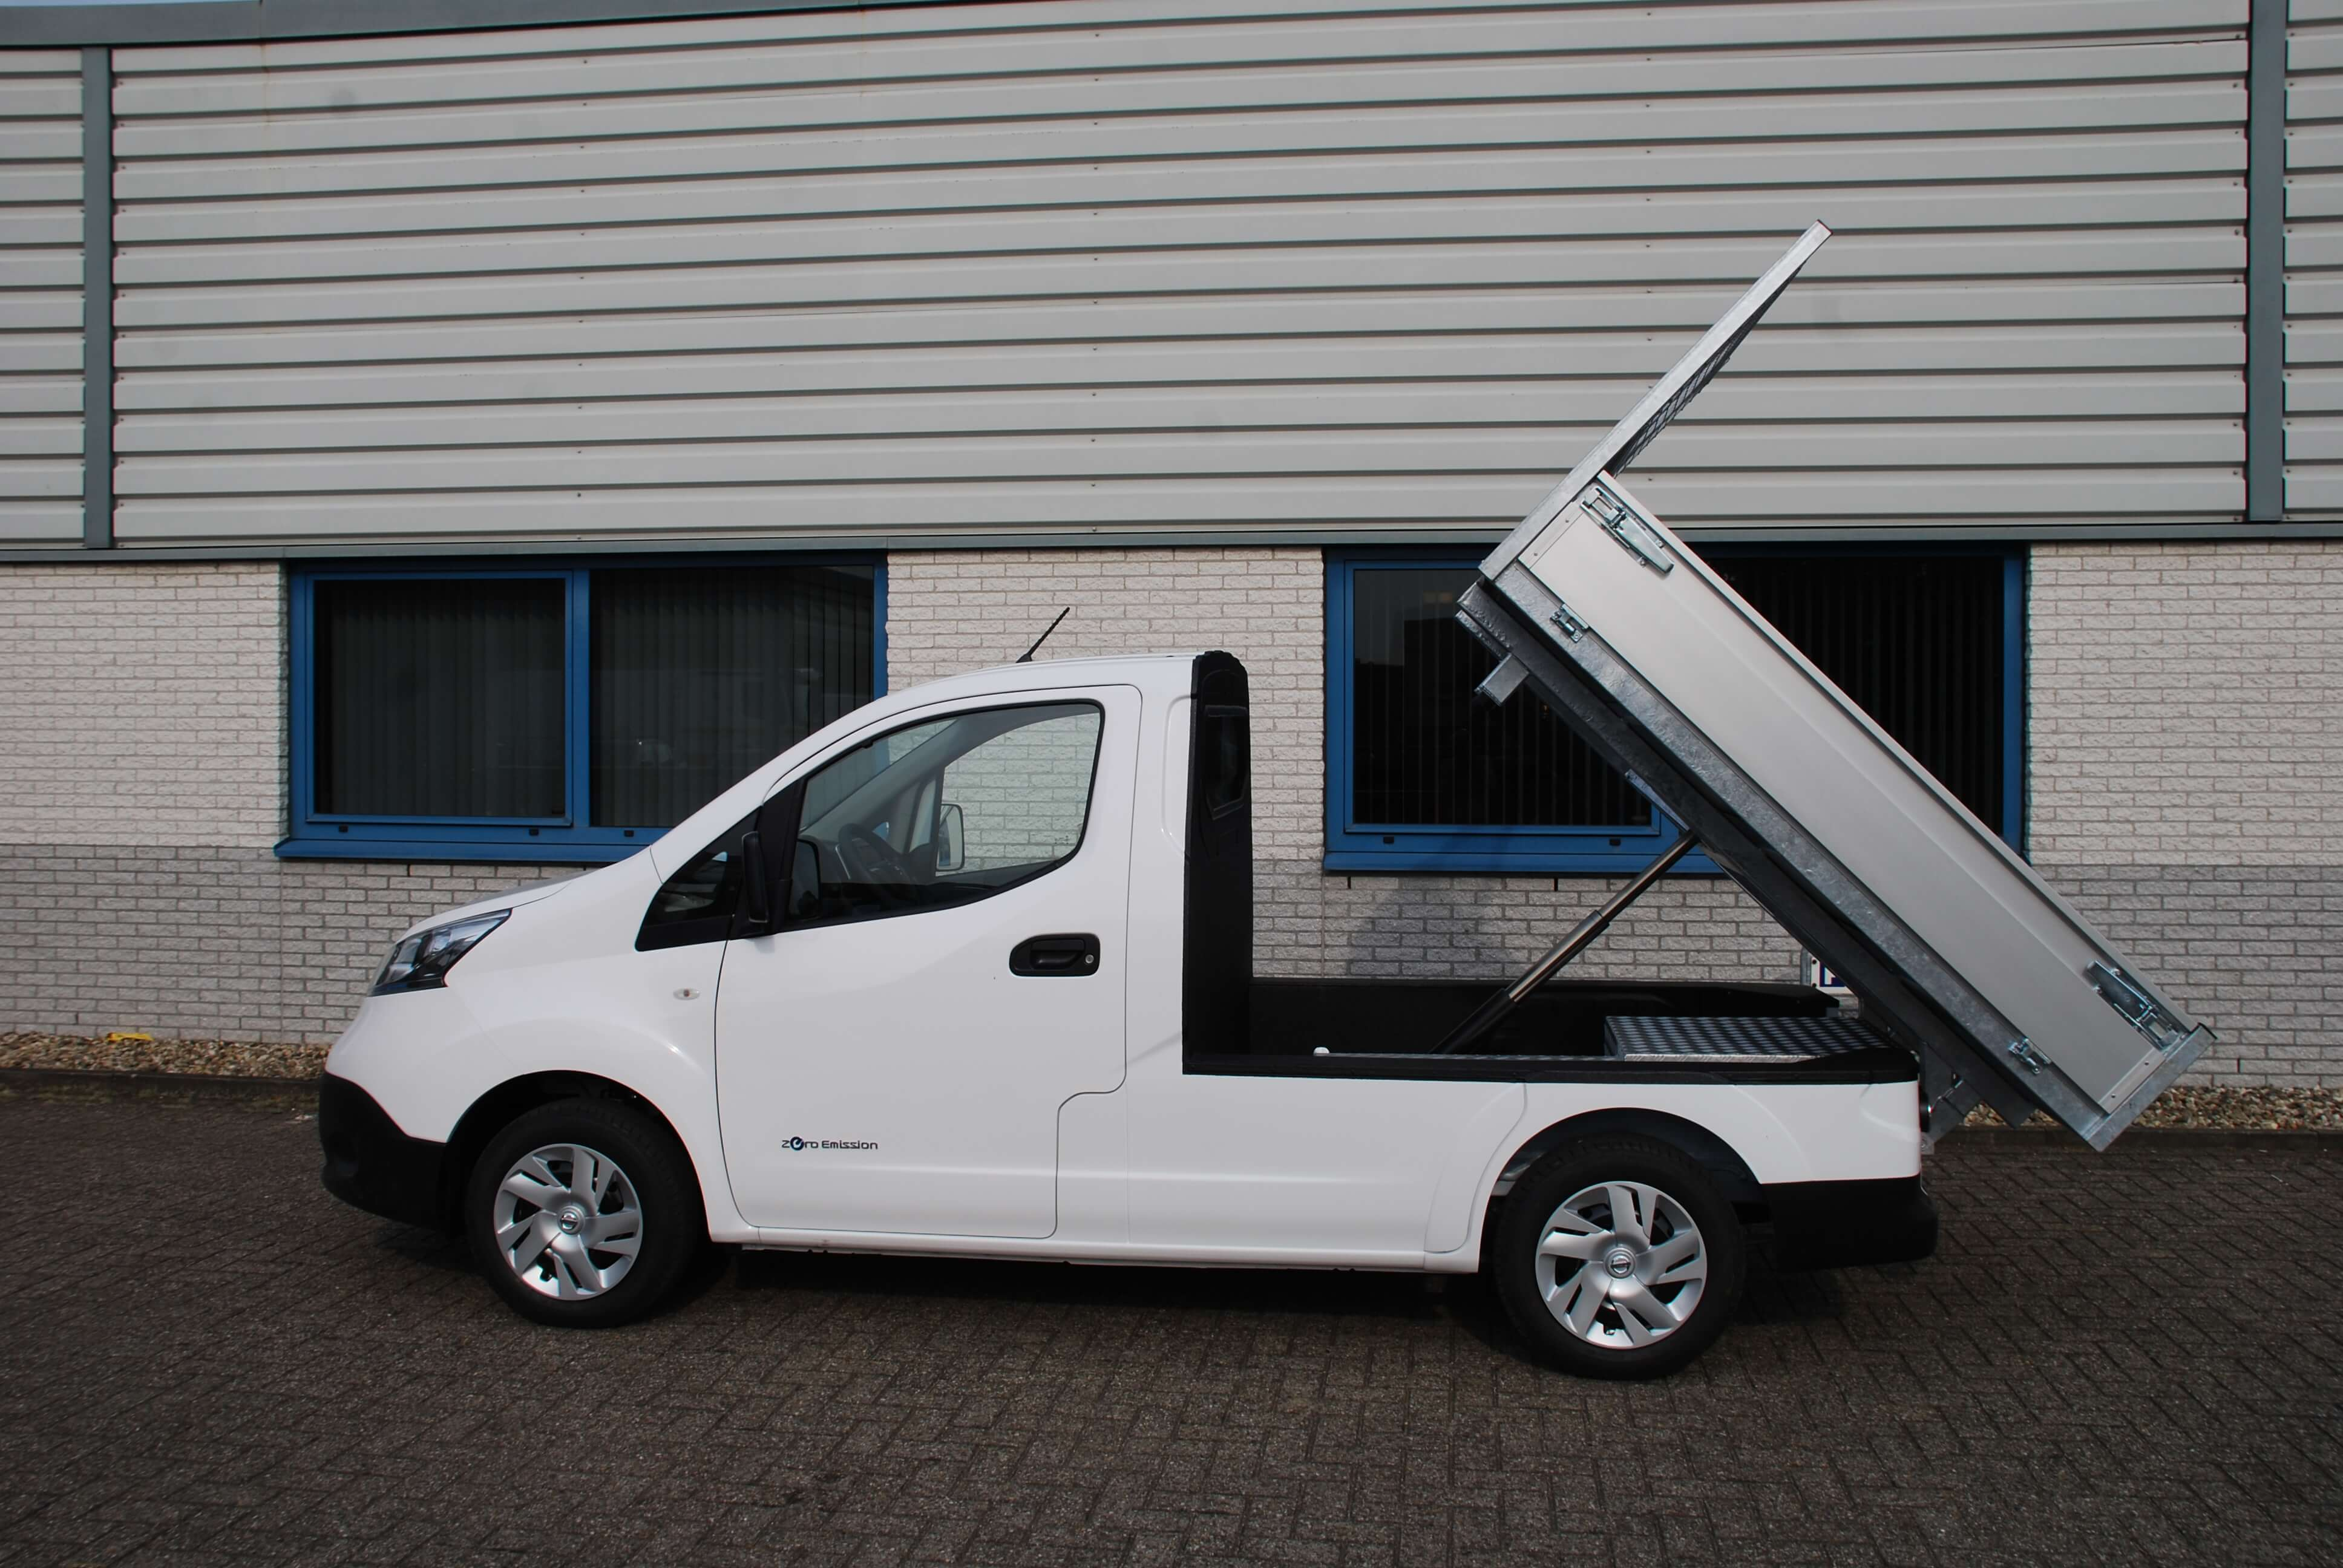 Chassis aanpassingen Nissan e-NV200 pick-up kipper